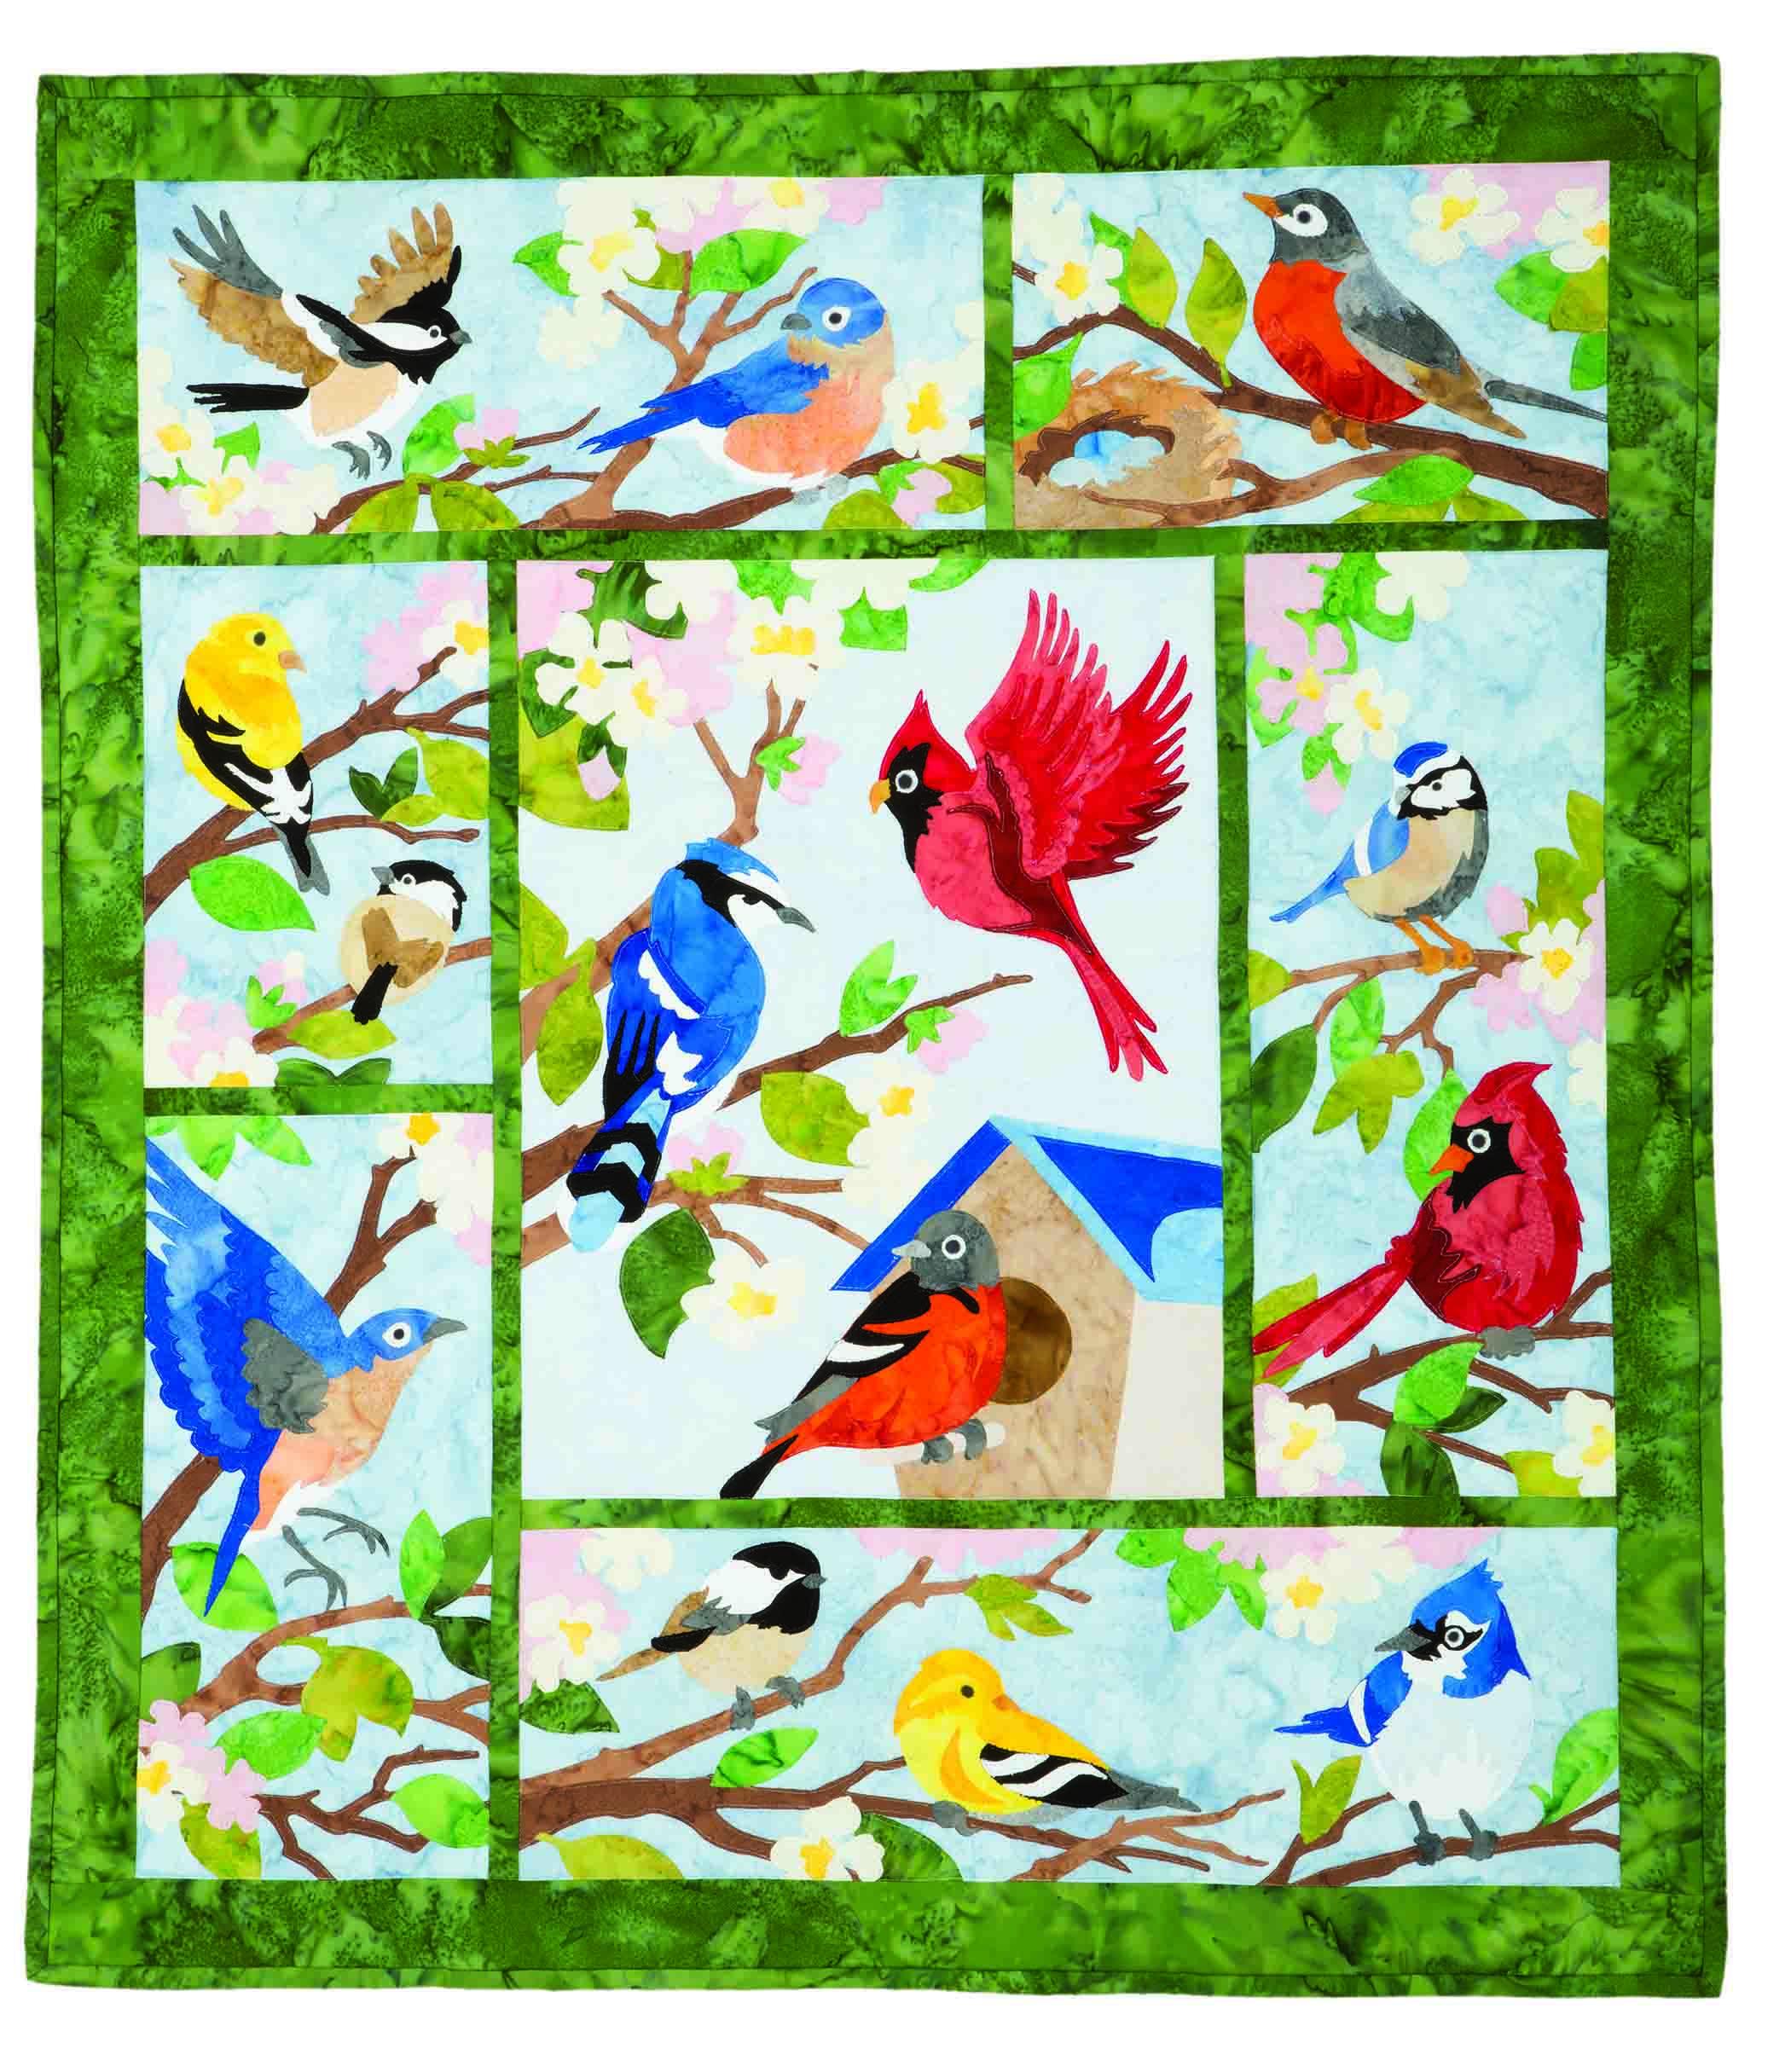 Kit- Songbird Sanctuary